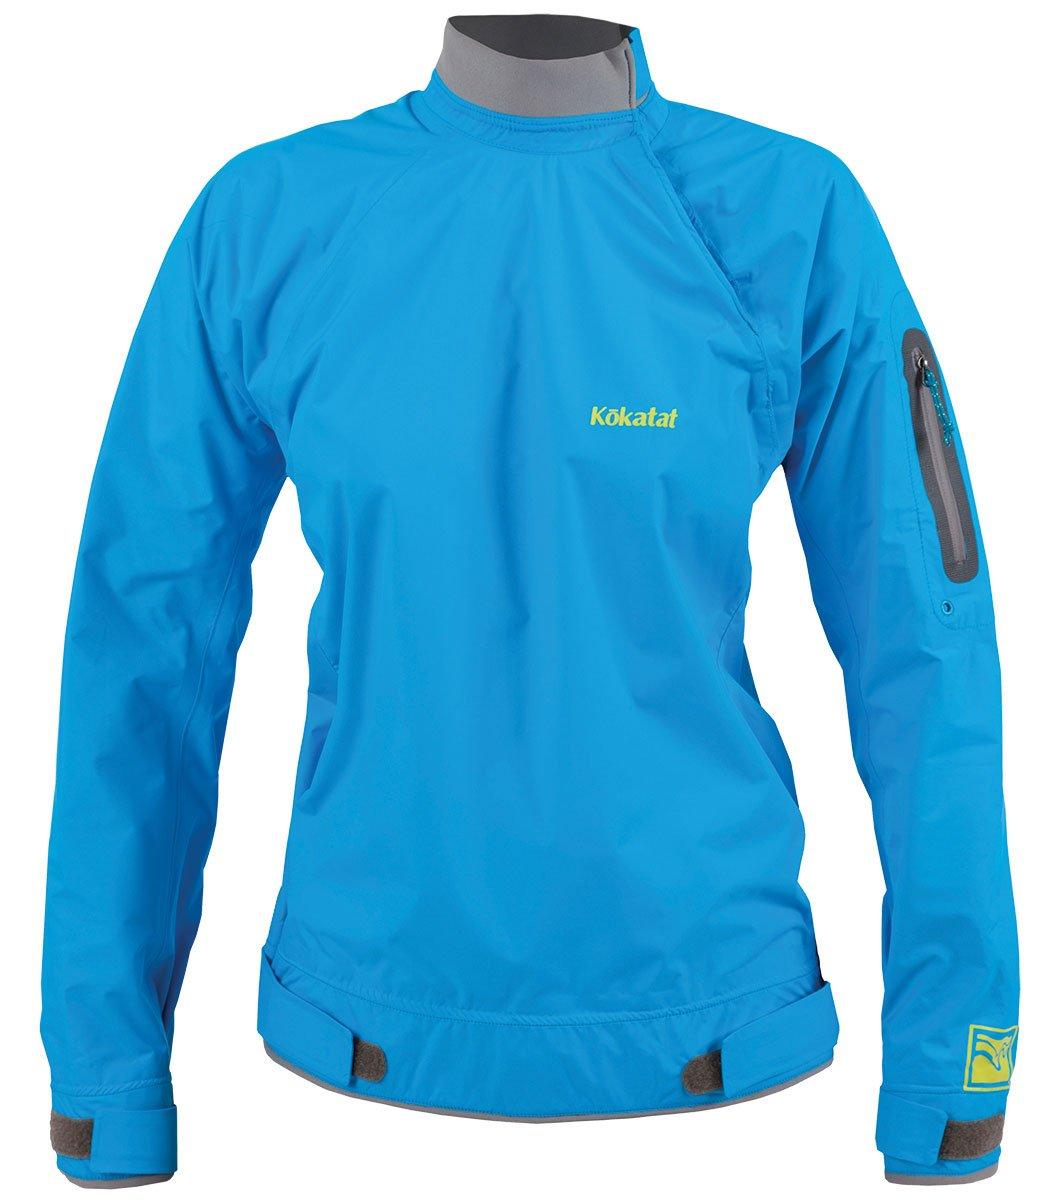 Kokatat Women's Hydrus Stance Paddling Jacket-Electric Blue-L by Kokatat